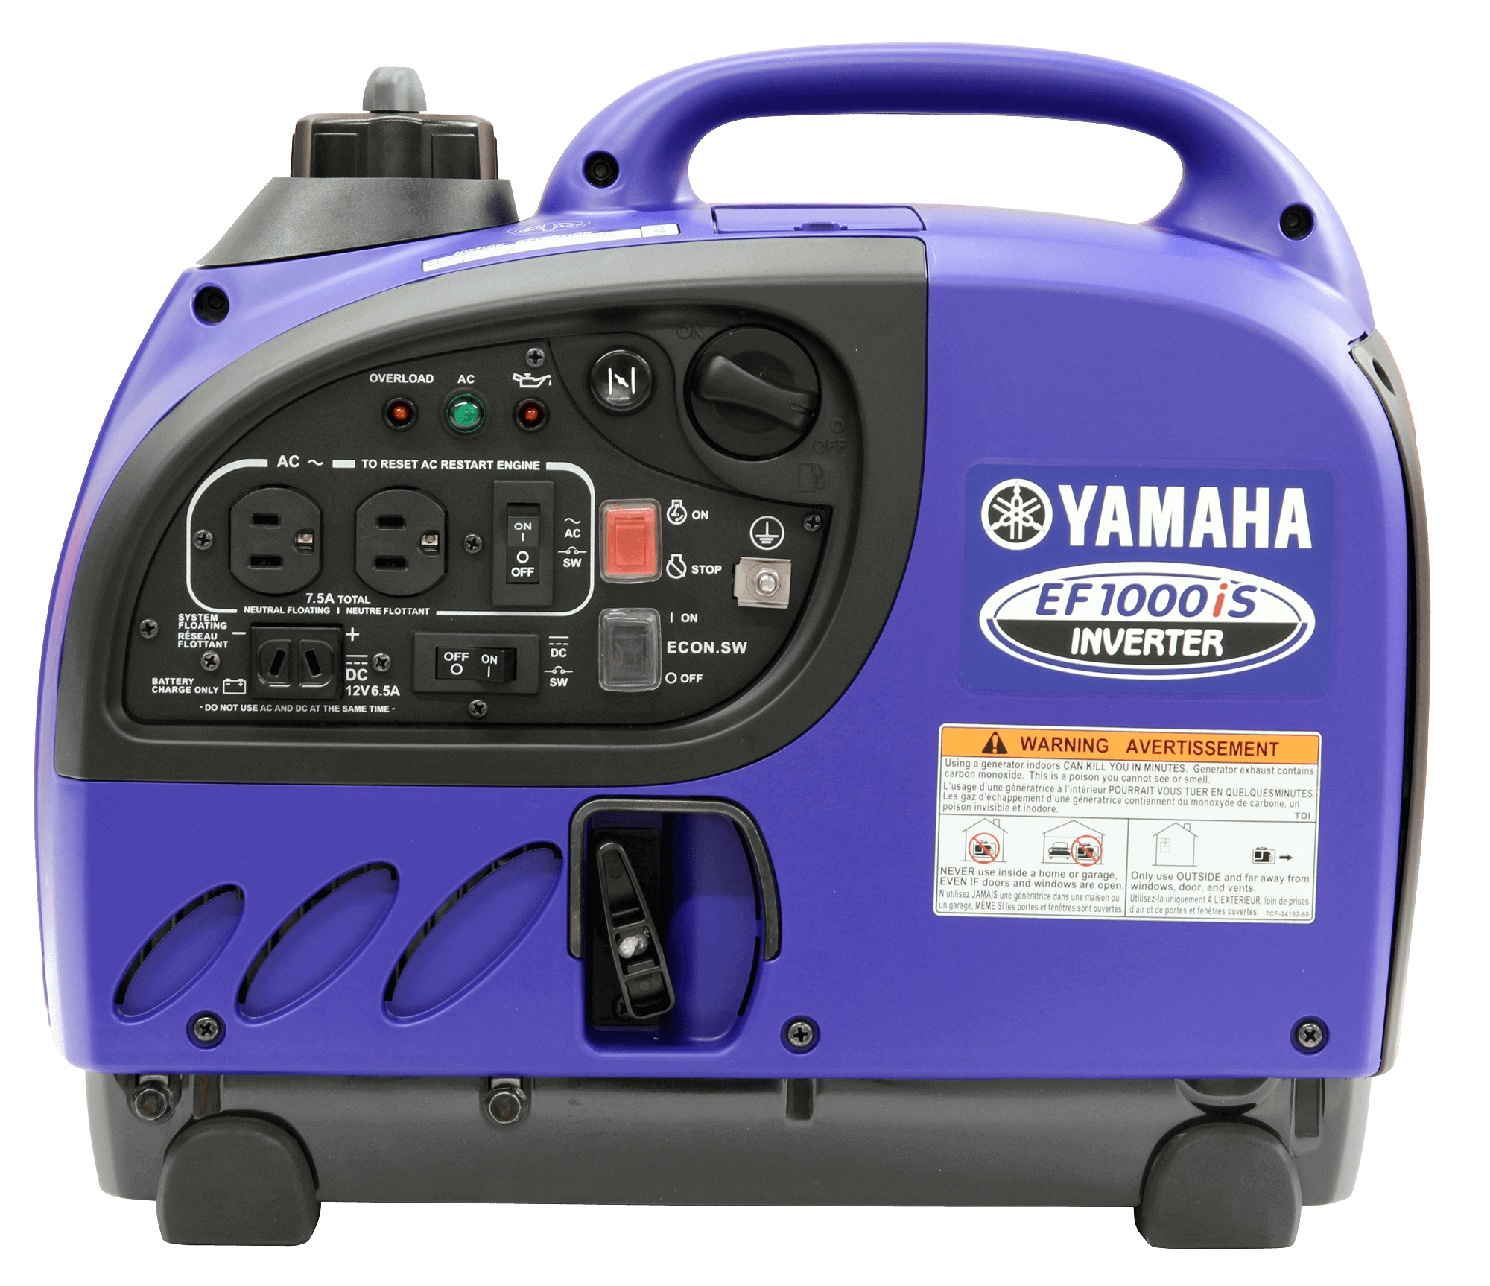 Yamaha Inverter Series EF1000IS